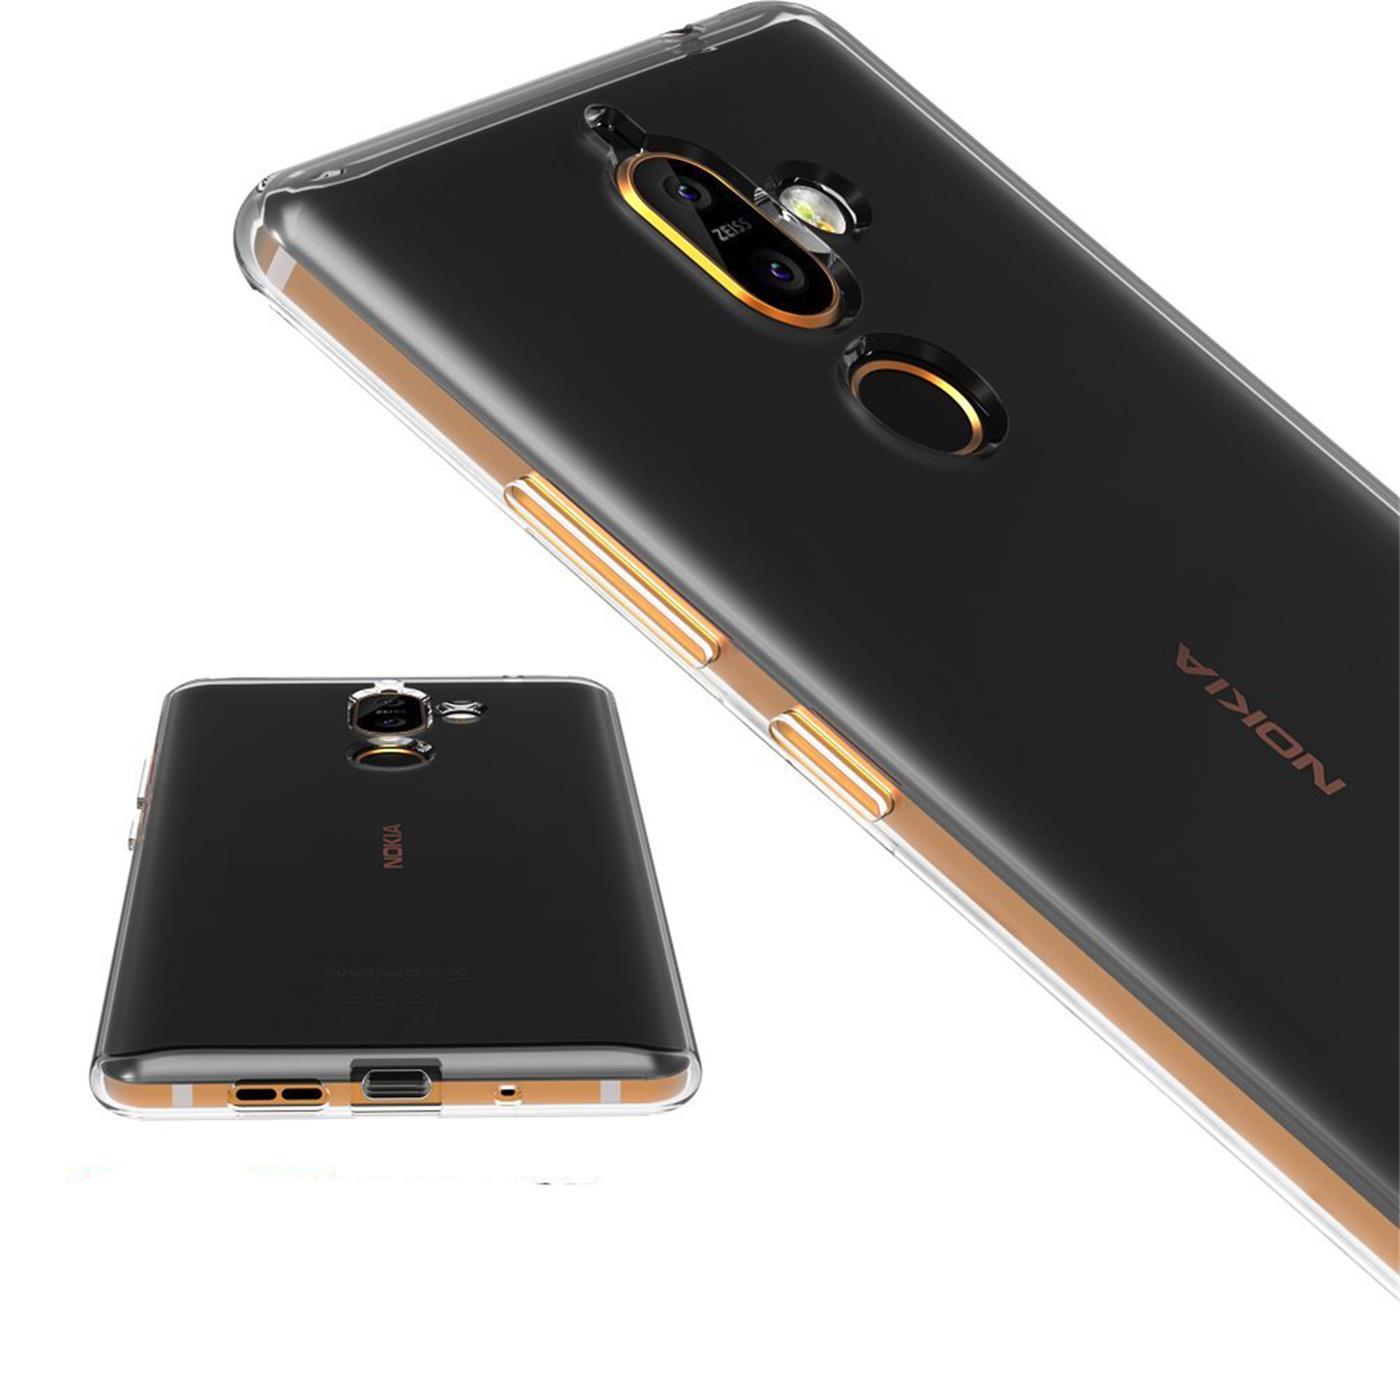 Nokia-7-Plus-Thin-Silikon-Klar-Case-Cover-Ultra-Slim-Stossfeste-Gel-Rueckseite Indexbild 10